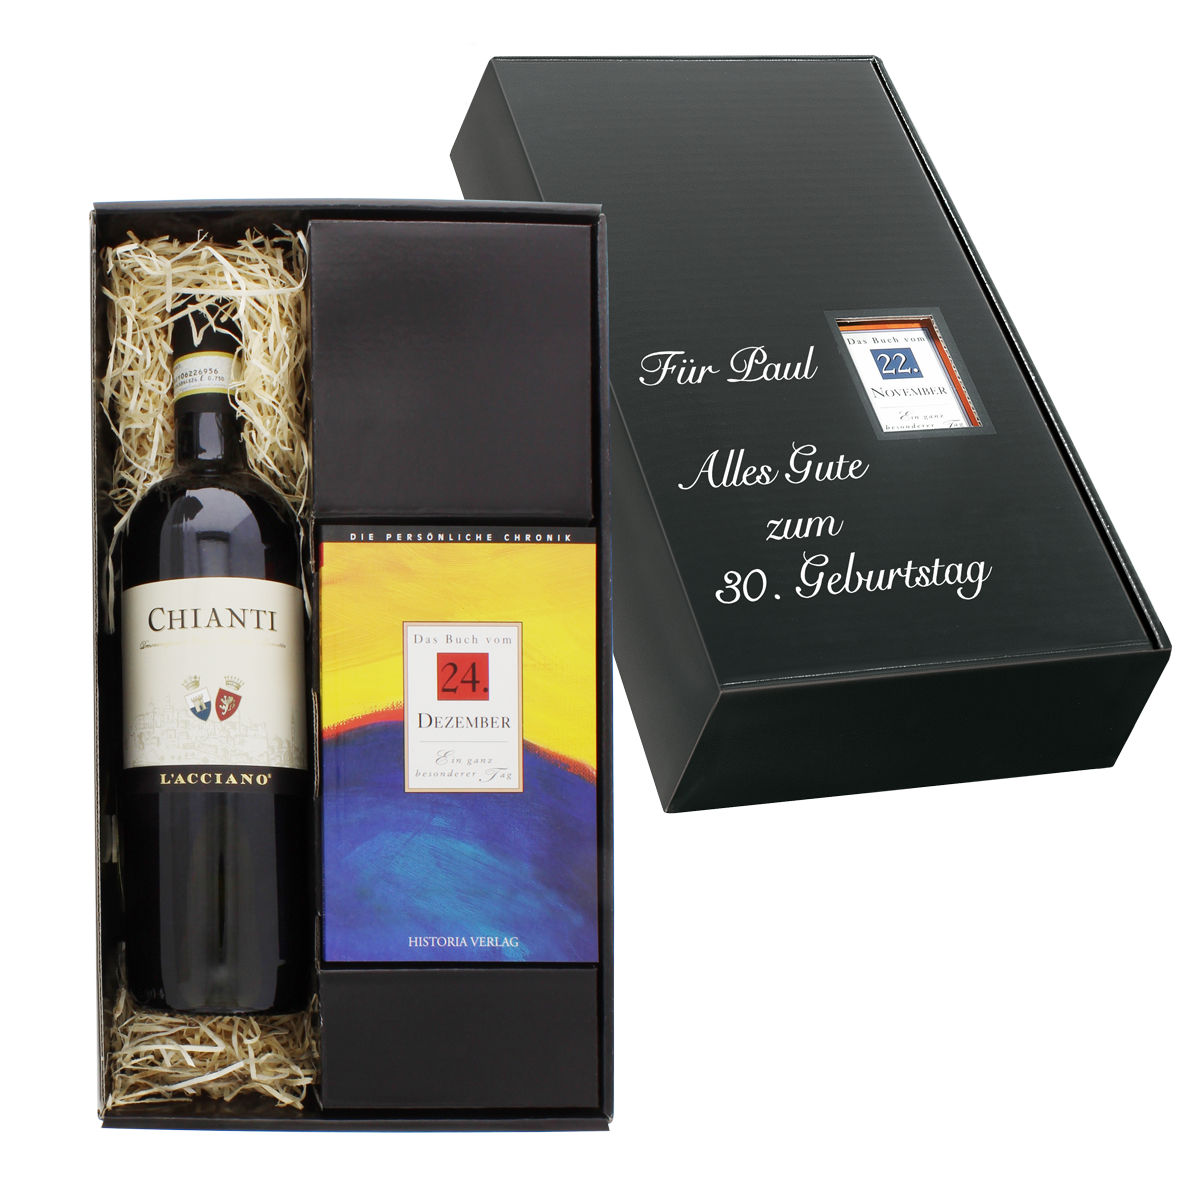 Italien-Set: Tageschronik vom 16. Januar & Chianti-Wein